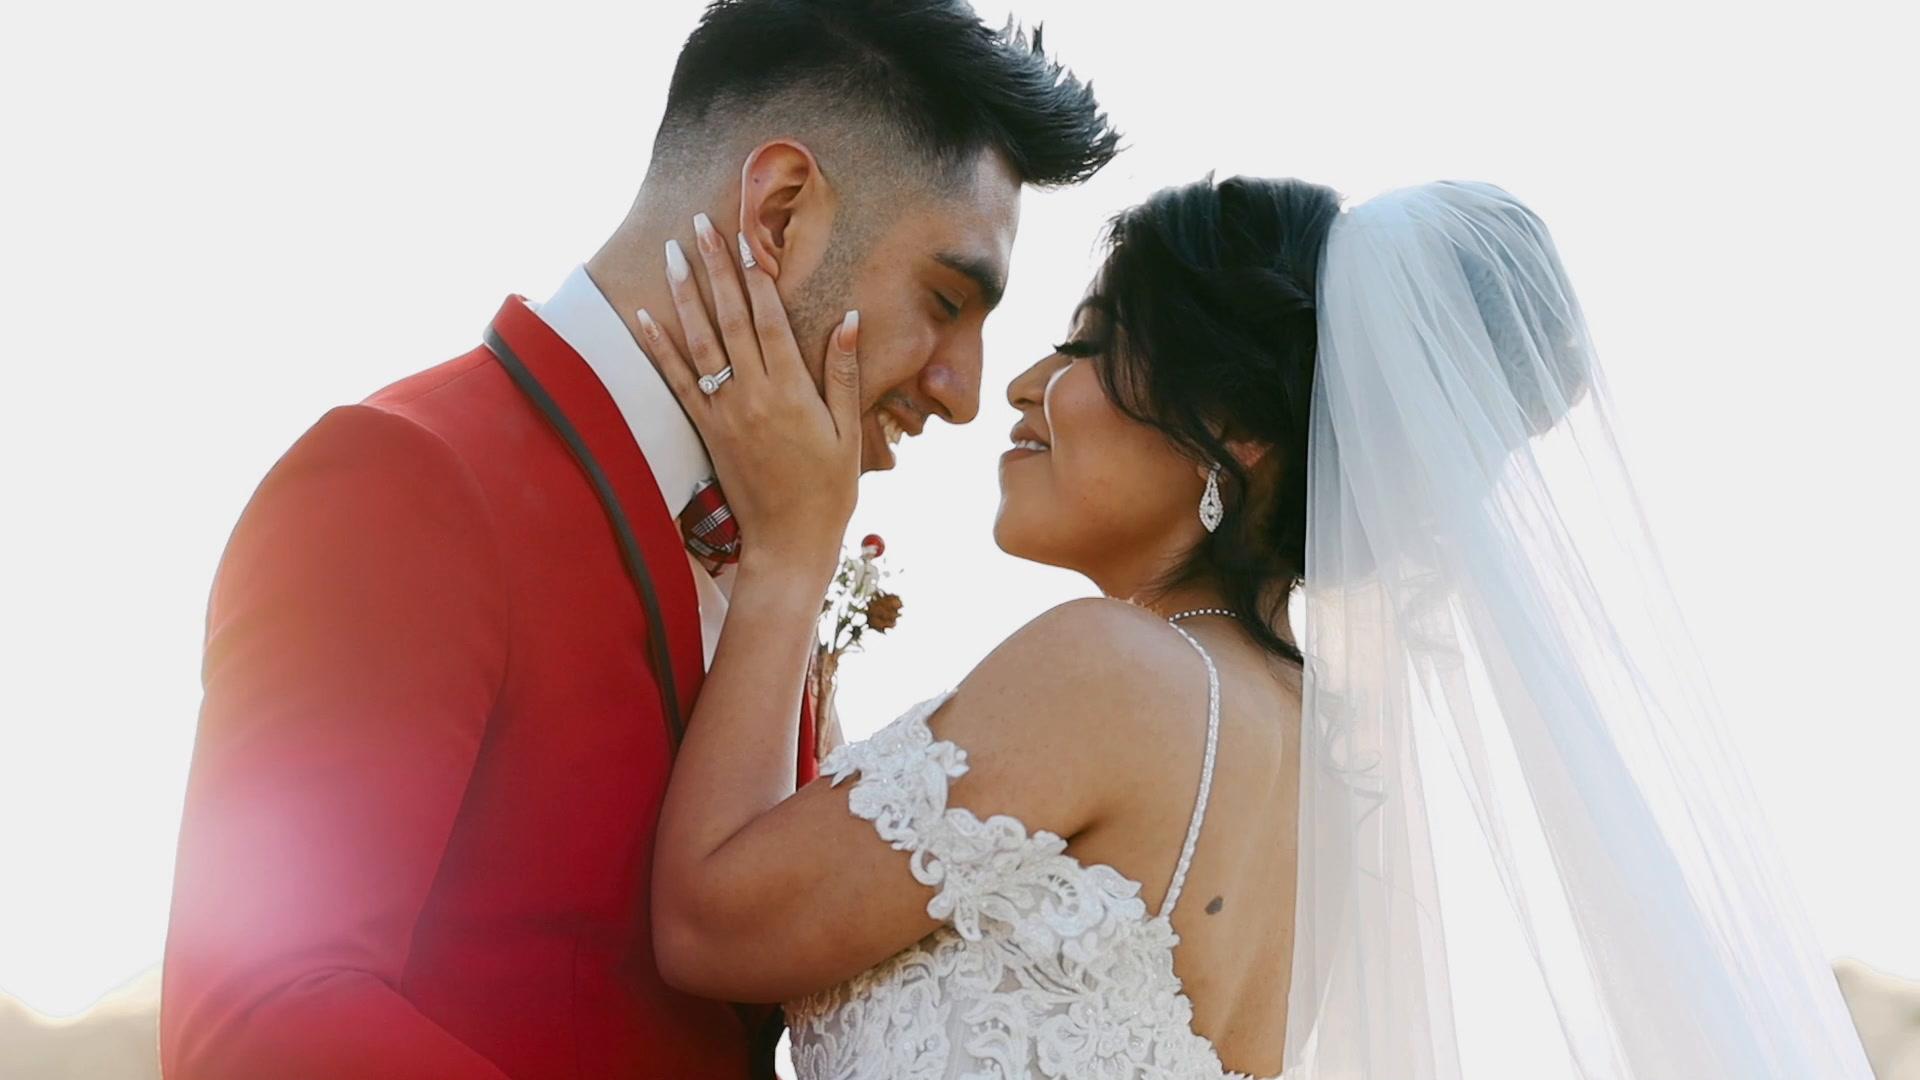 Couple embracing in fun, boho Mexican wedding